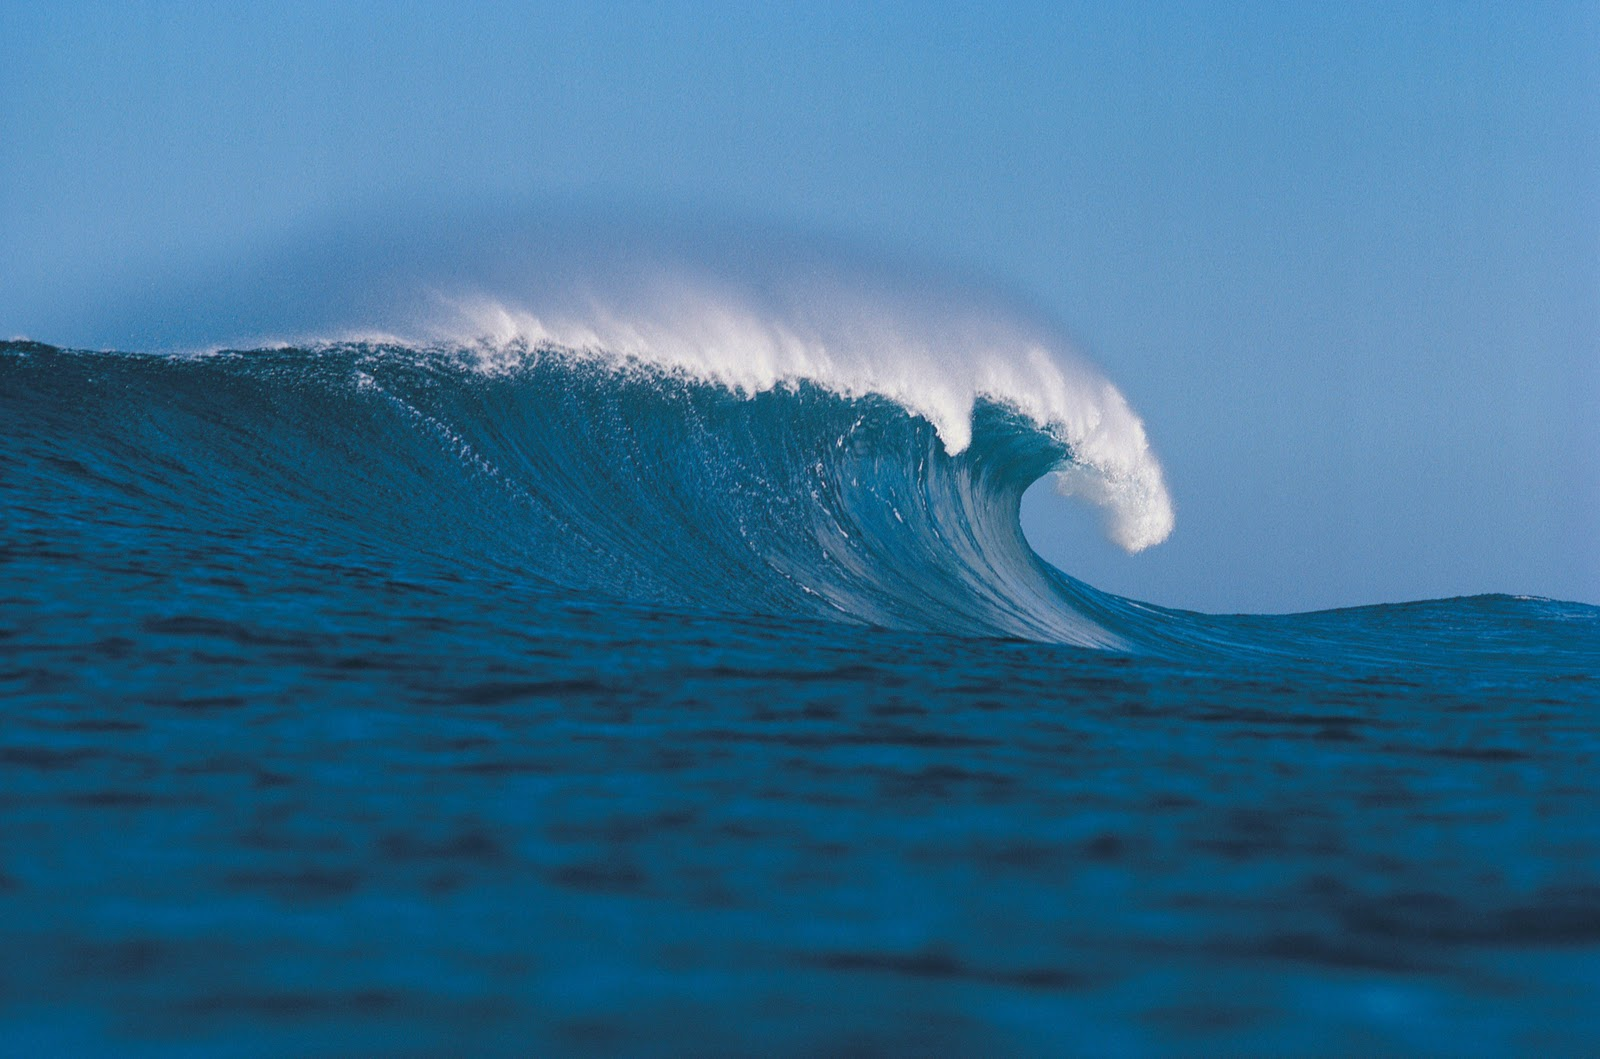 wallpaper foto ombak lautan yang dahsyat